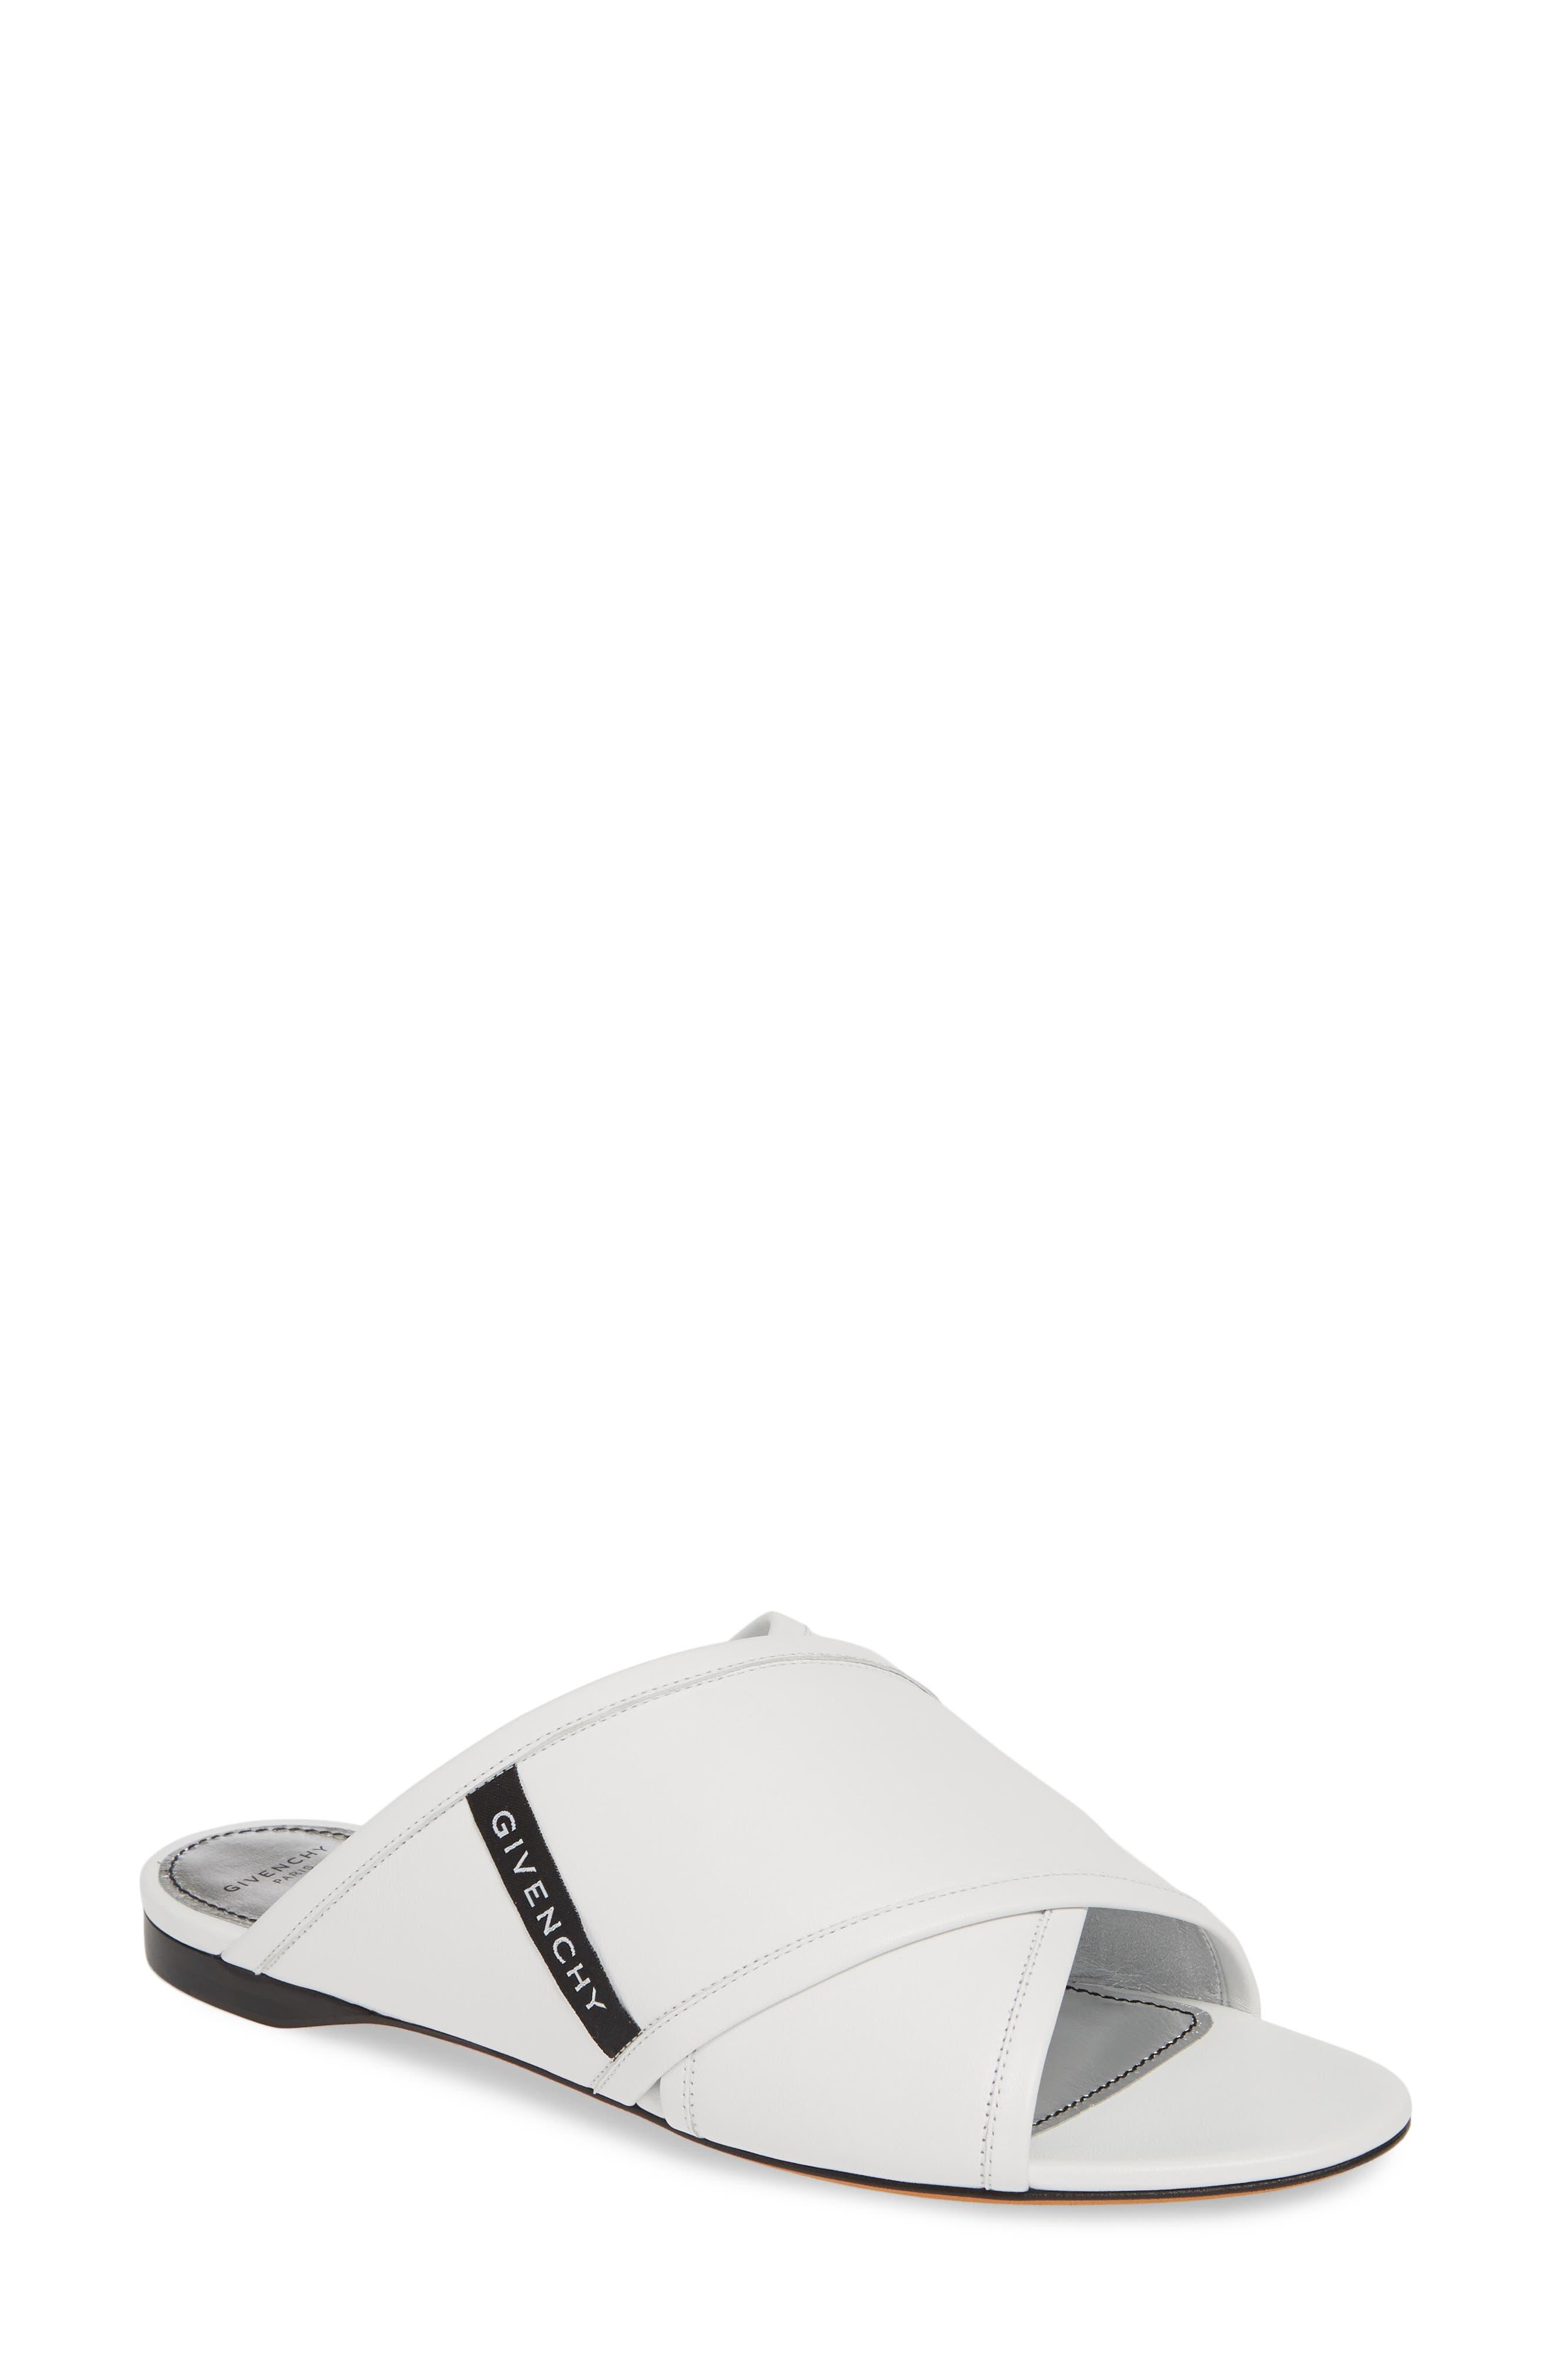 Givenchy Rivington Crisscross Sandal - White